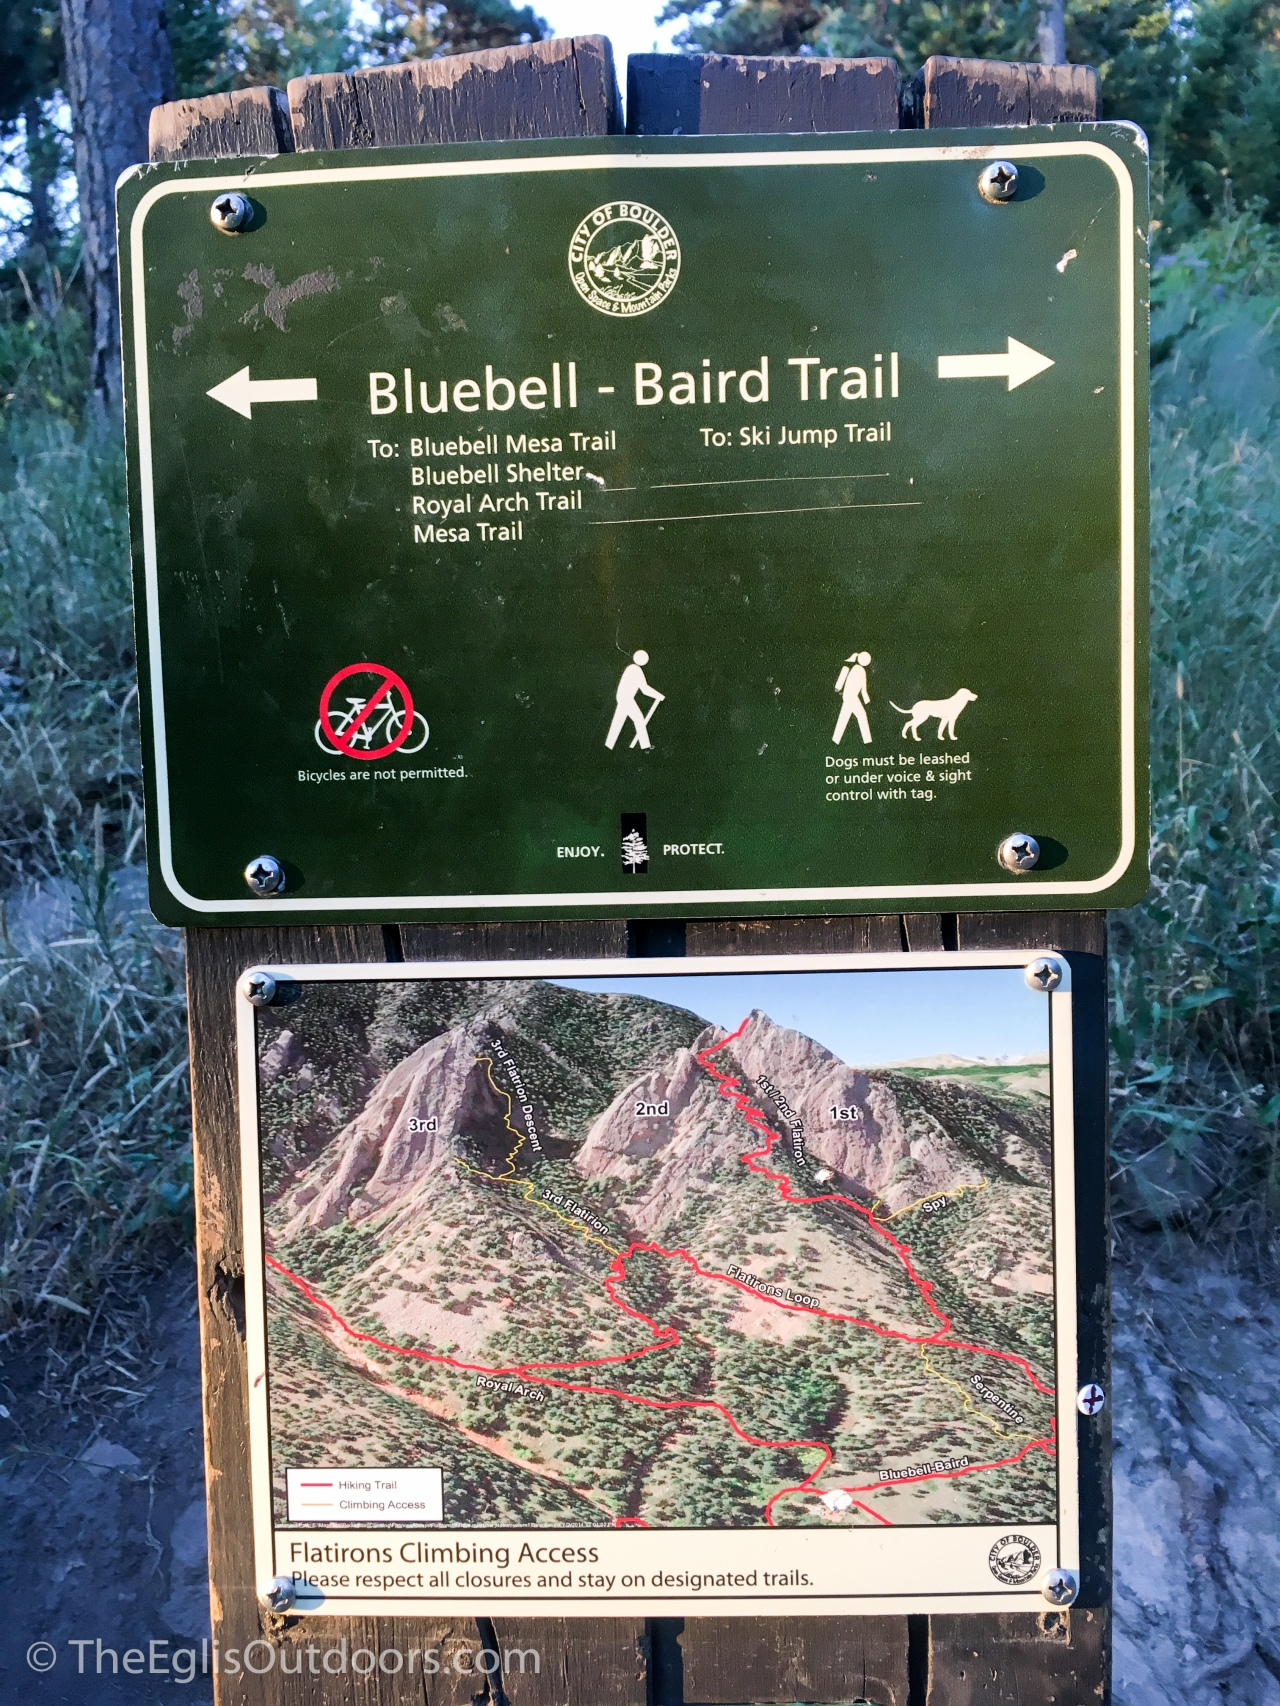 chautauqua-park_boulder_the-eglis-outdoors-6410